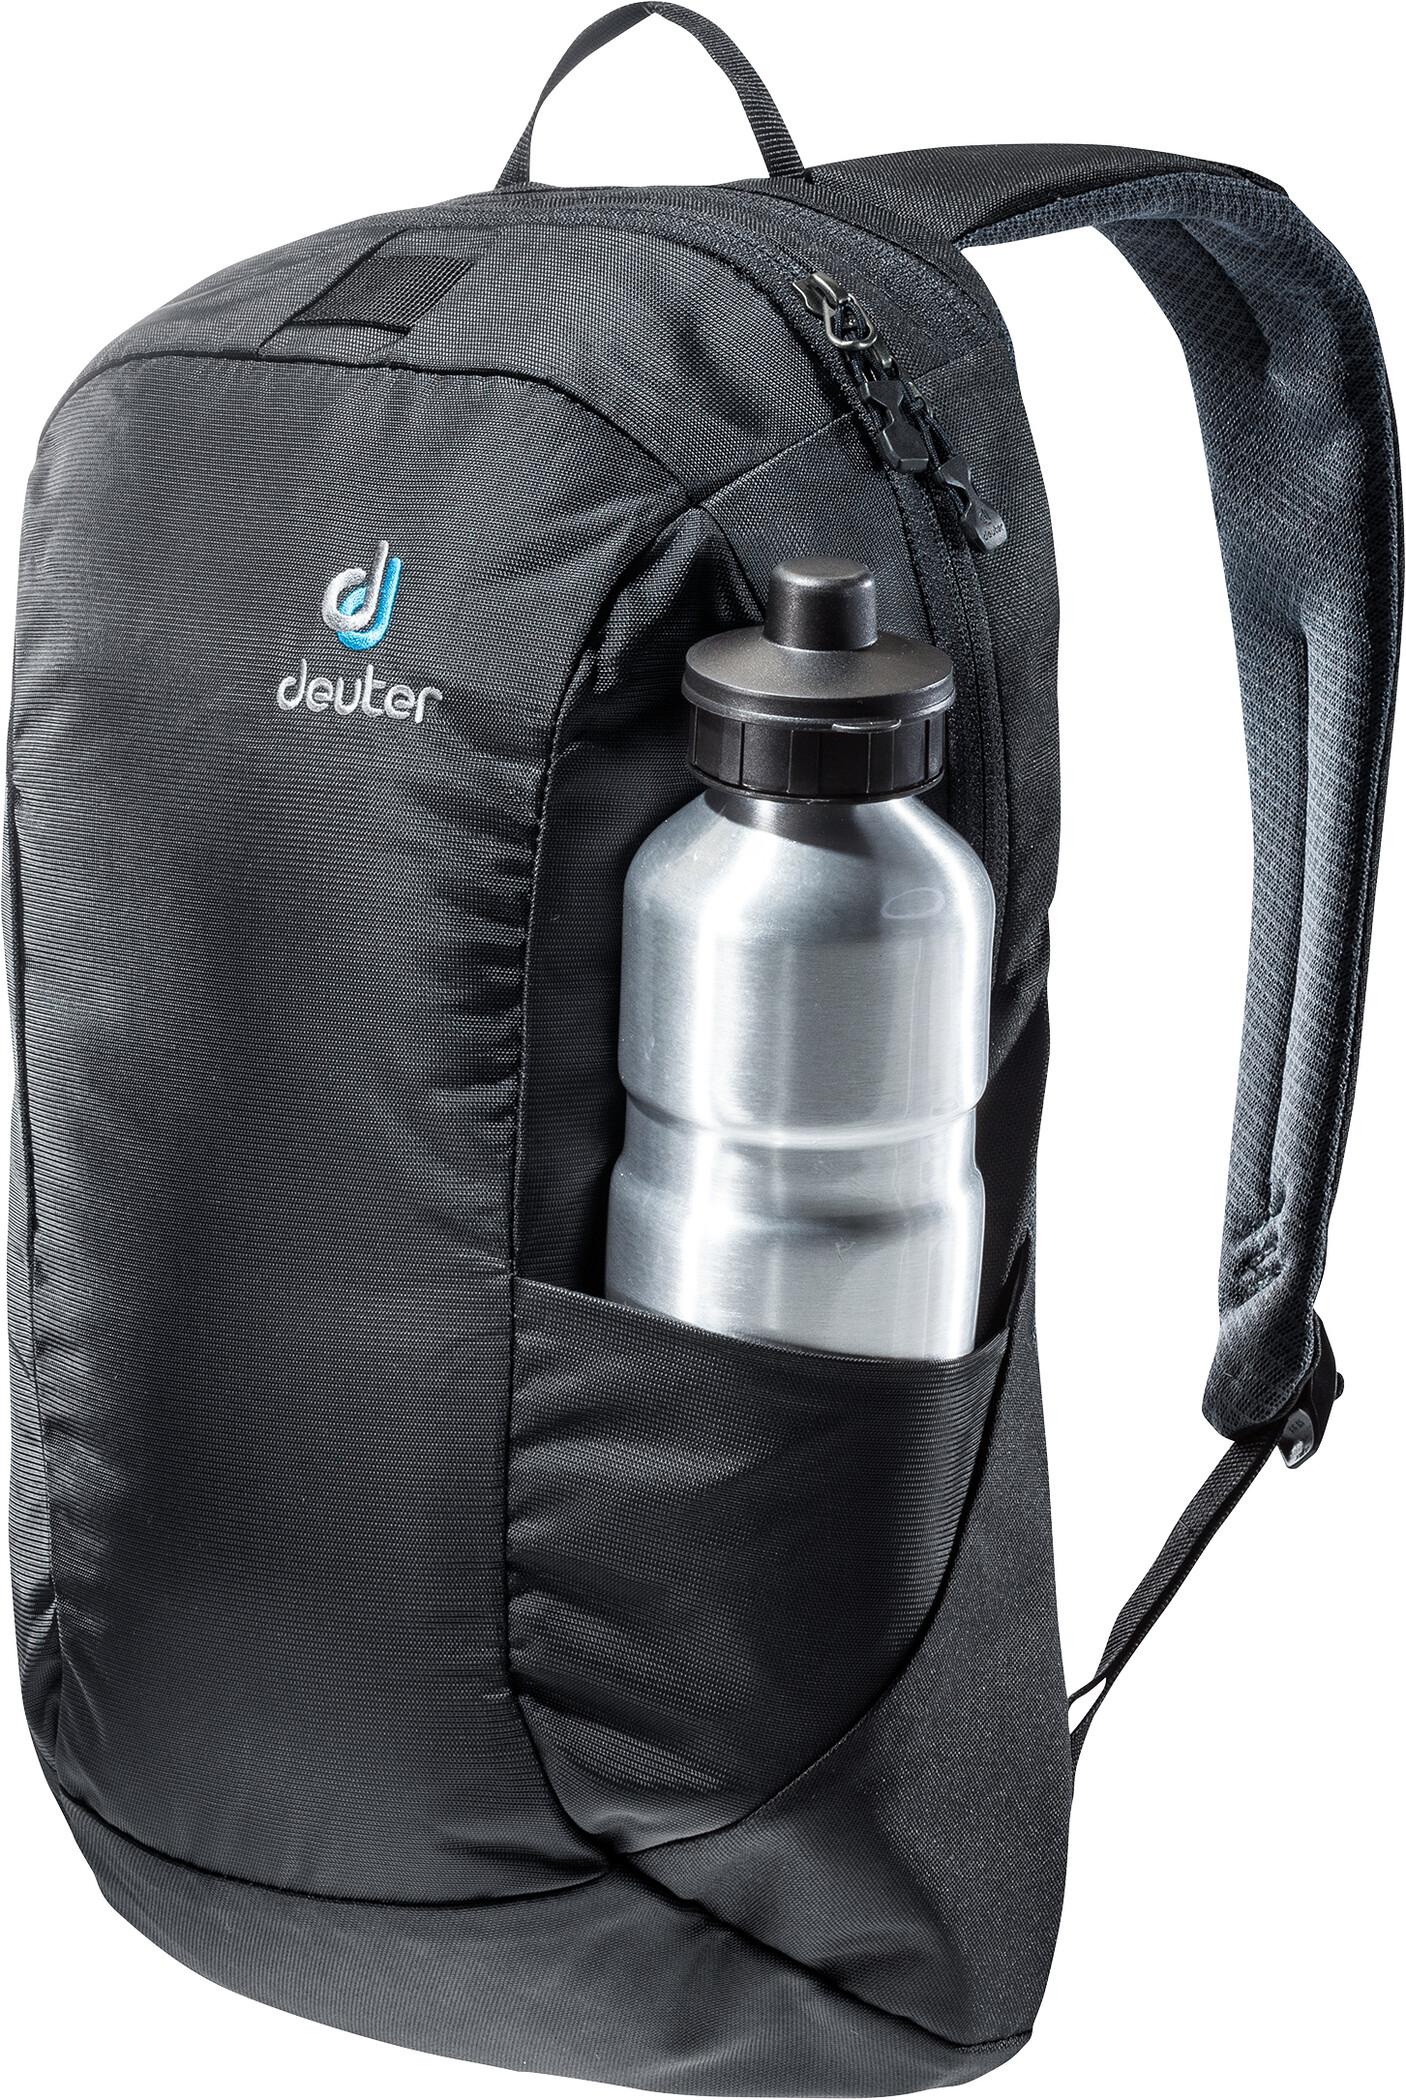 Deuter Aviant Access Pro 60 Travel Pack black